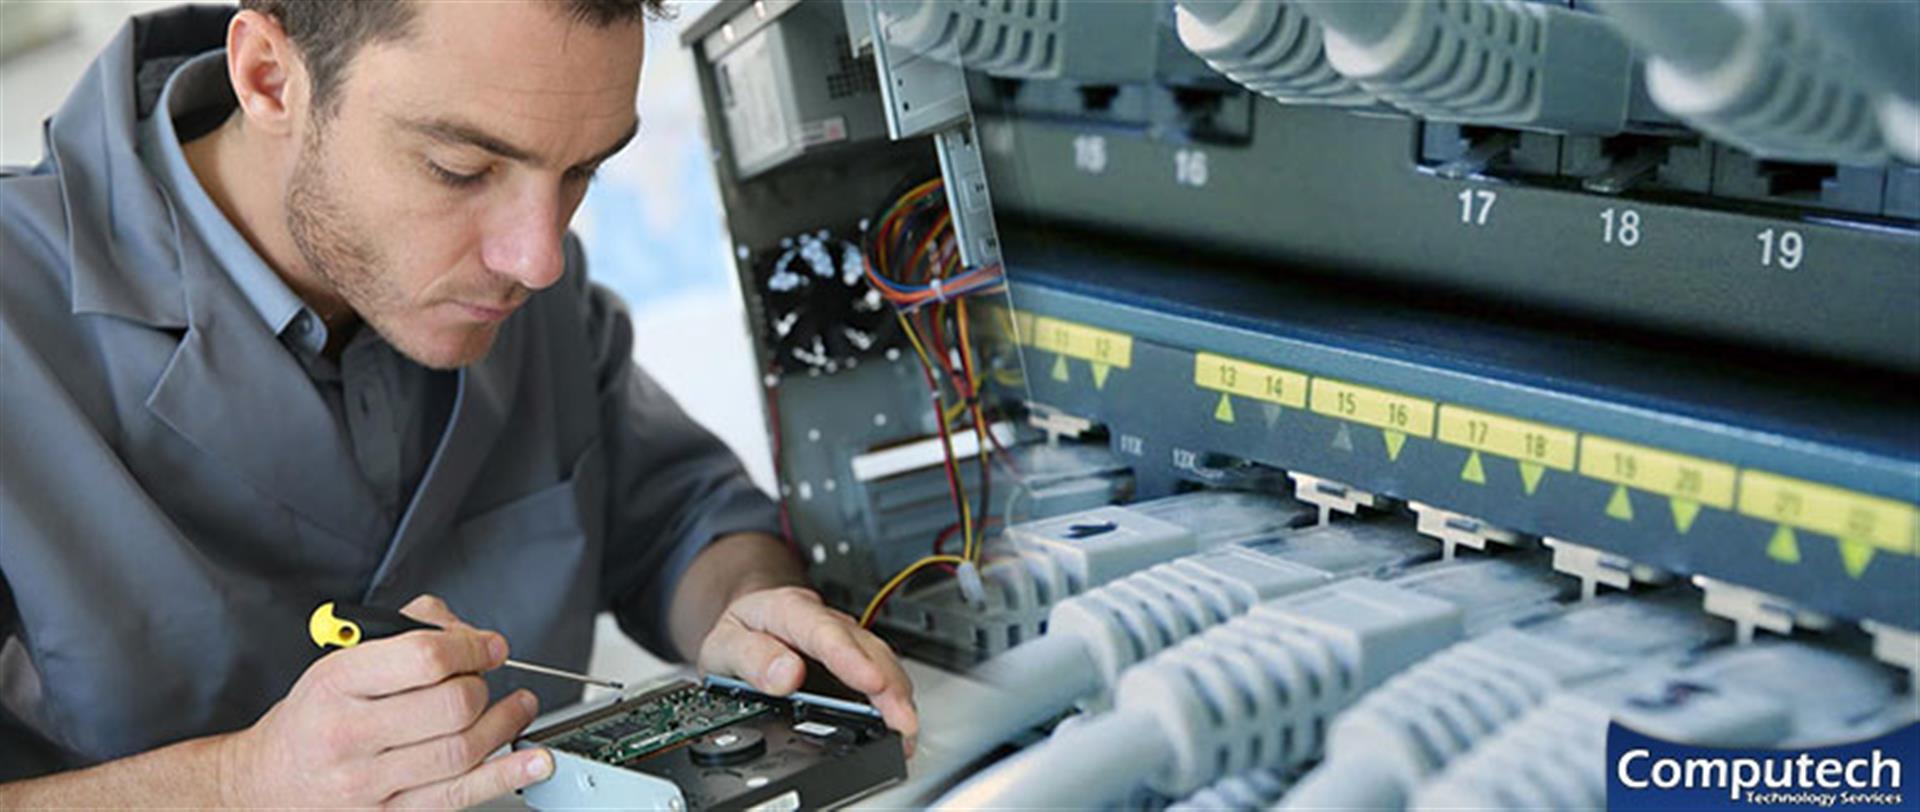 Tucson Arizona Onsite Computer & Printer Repairs, Networks, Telecom and High Speed Data Wiring Solutions